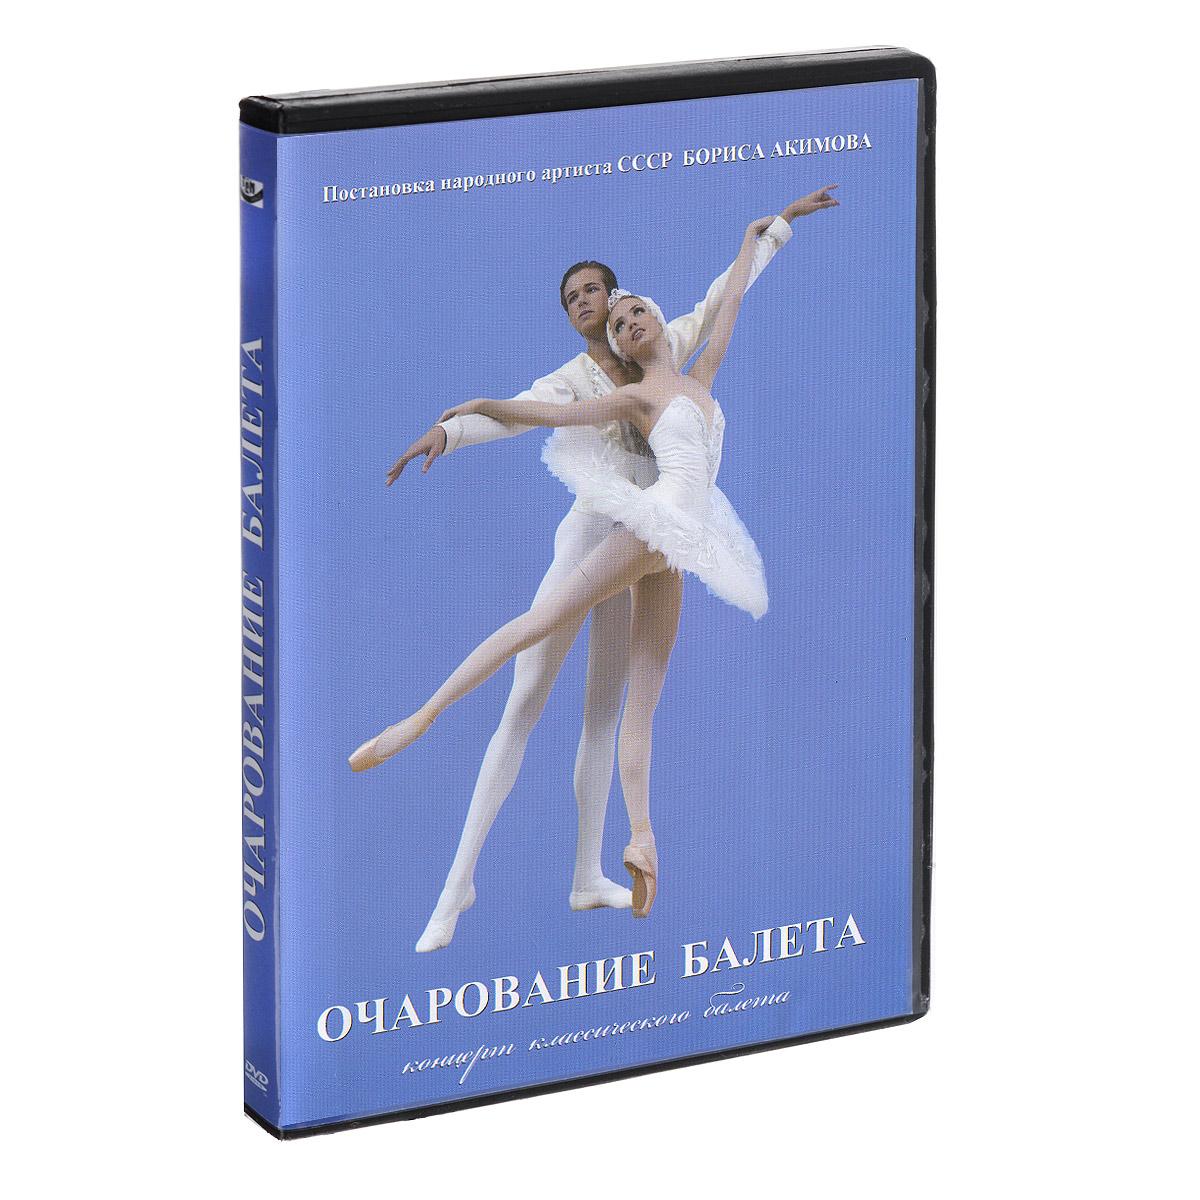 Очарование балета: Концерт классического балета е я суриц артист балета михаил михайлович мордкин